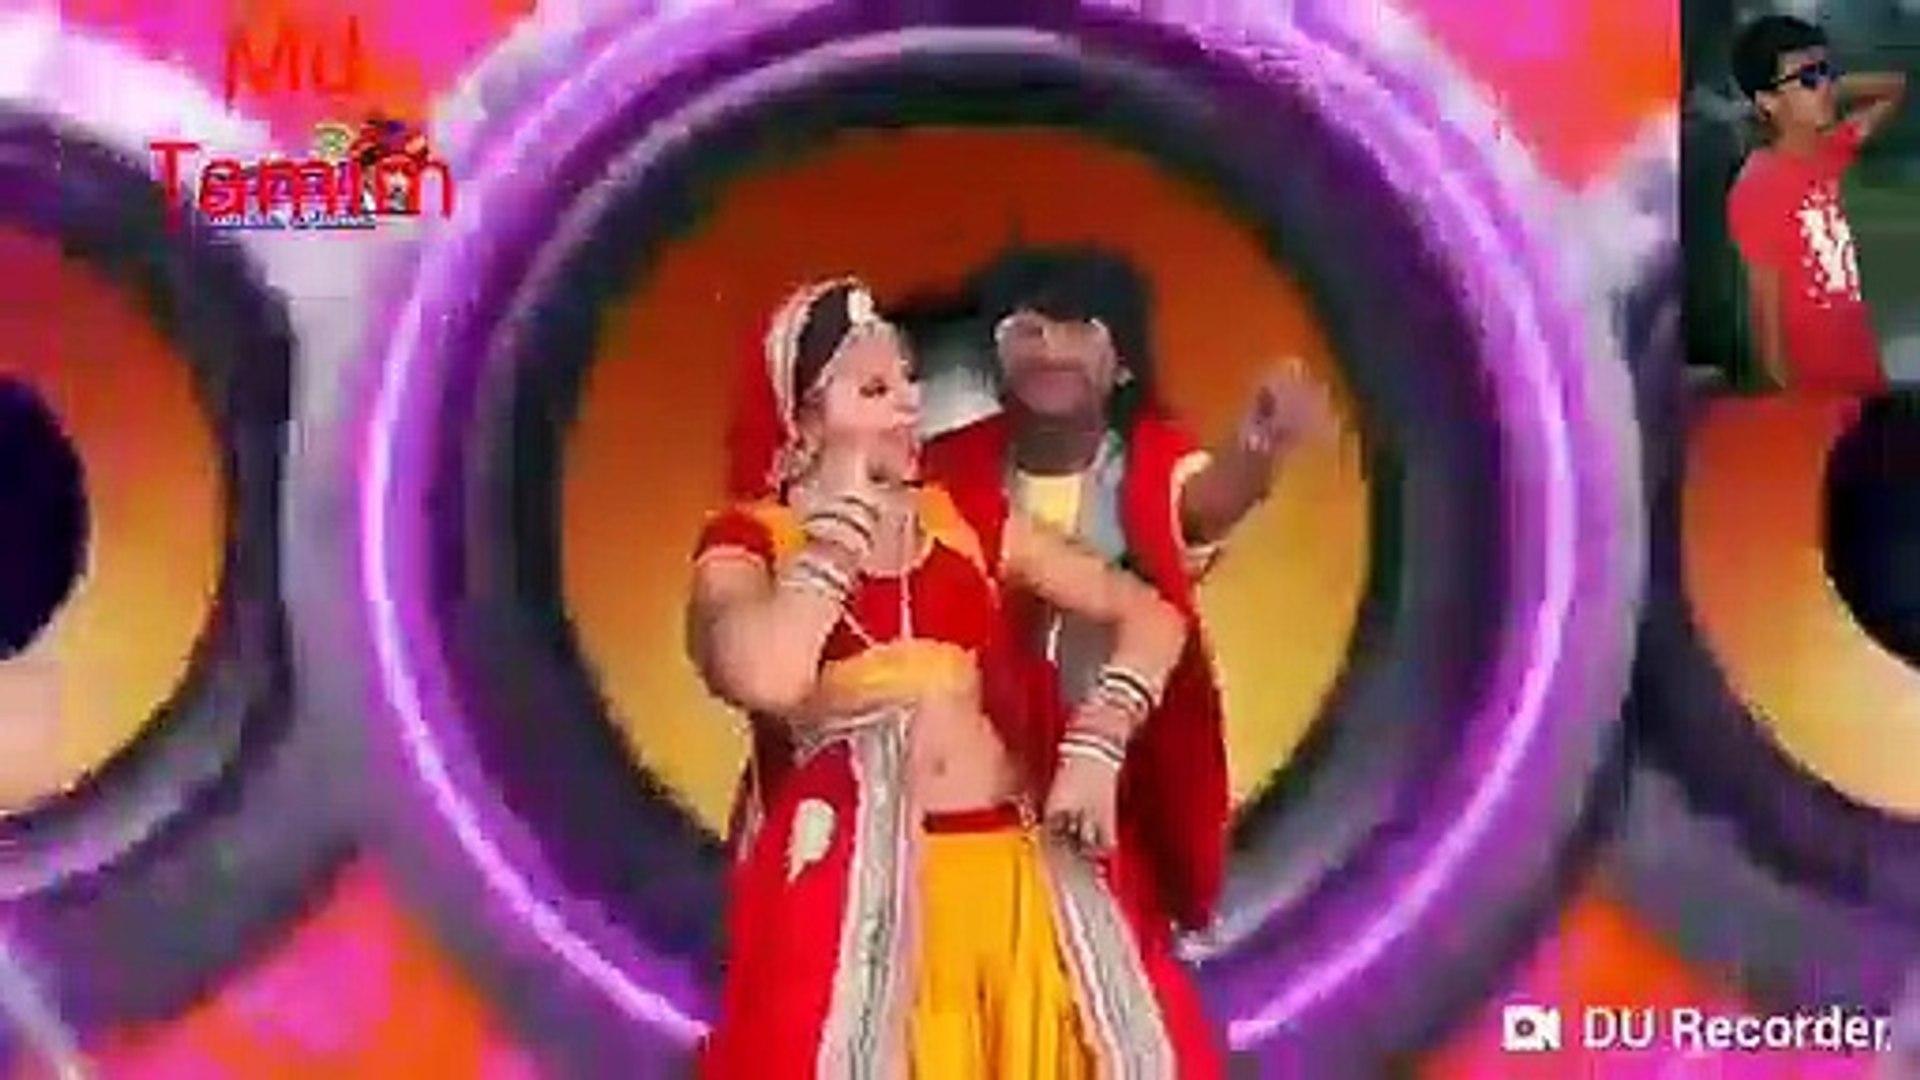 Dj_wala_babo_mera_gana_bajate_dj_song(360p)old song,new song,indin song,hinde song,old indin song,ol